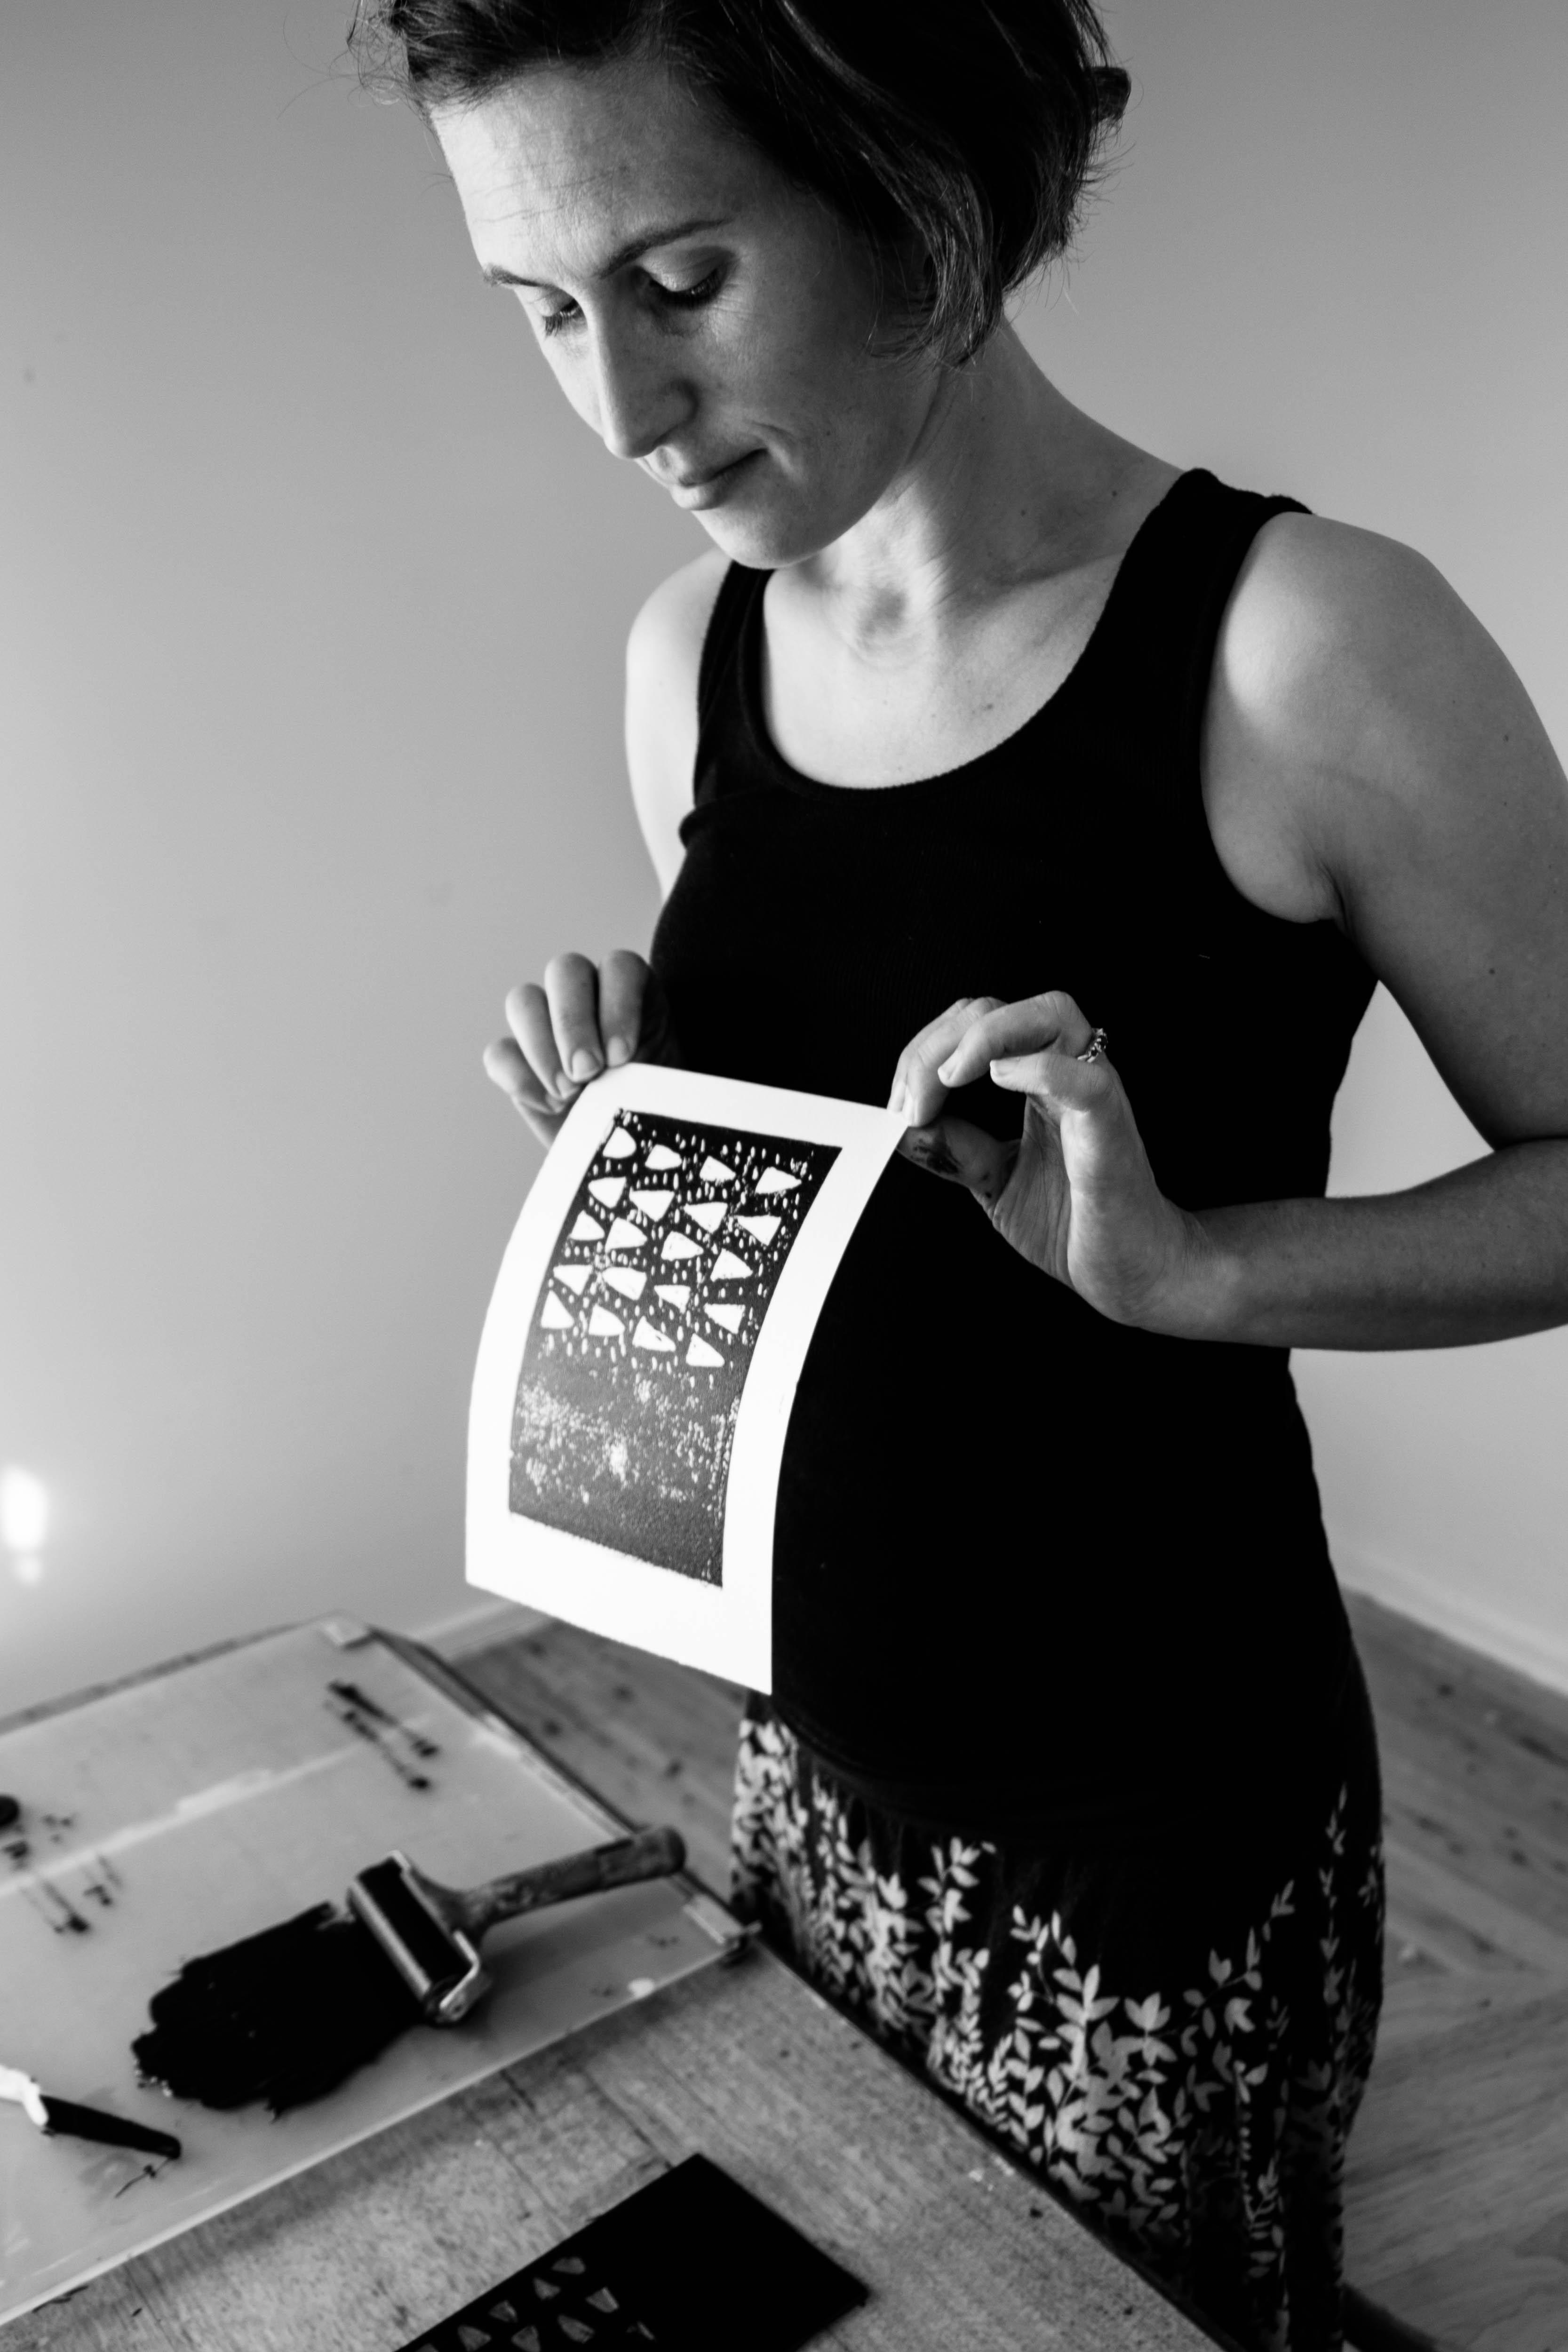 Lino Cut Printing